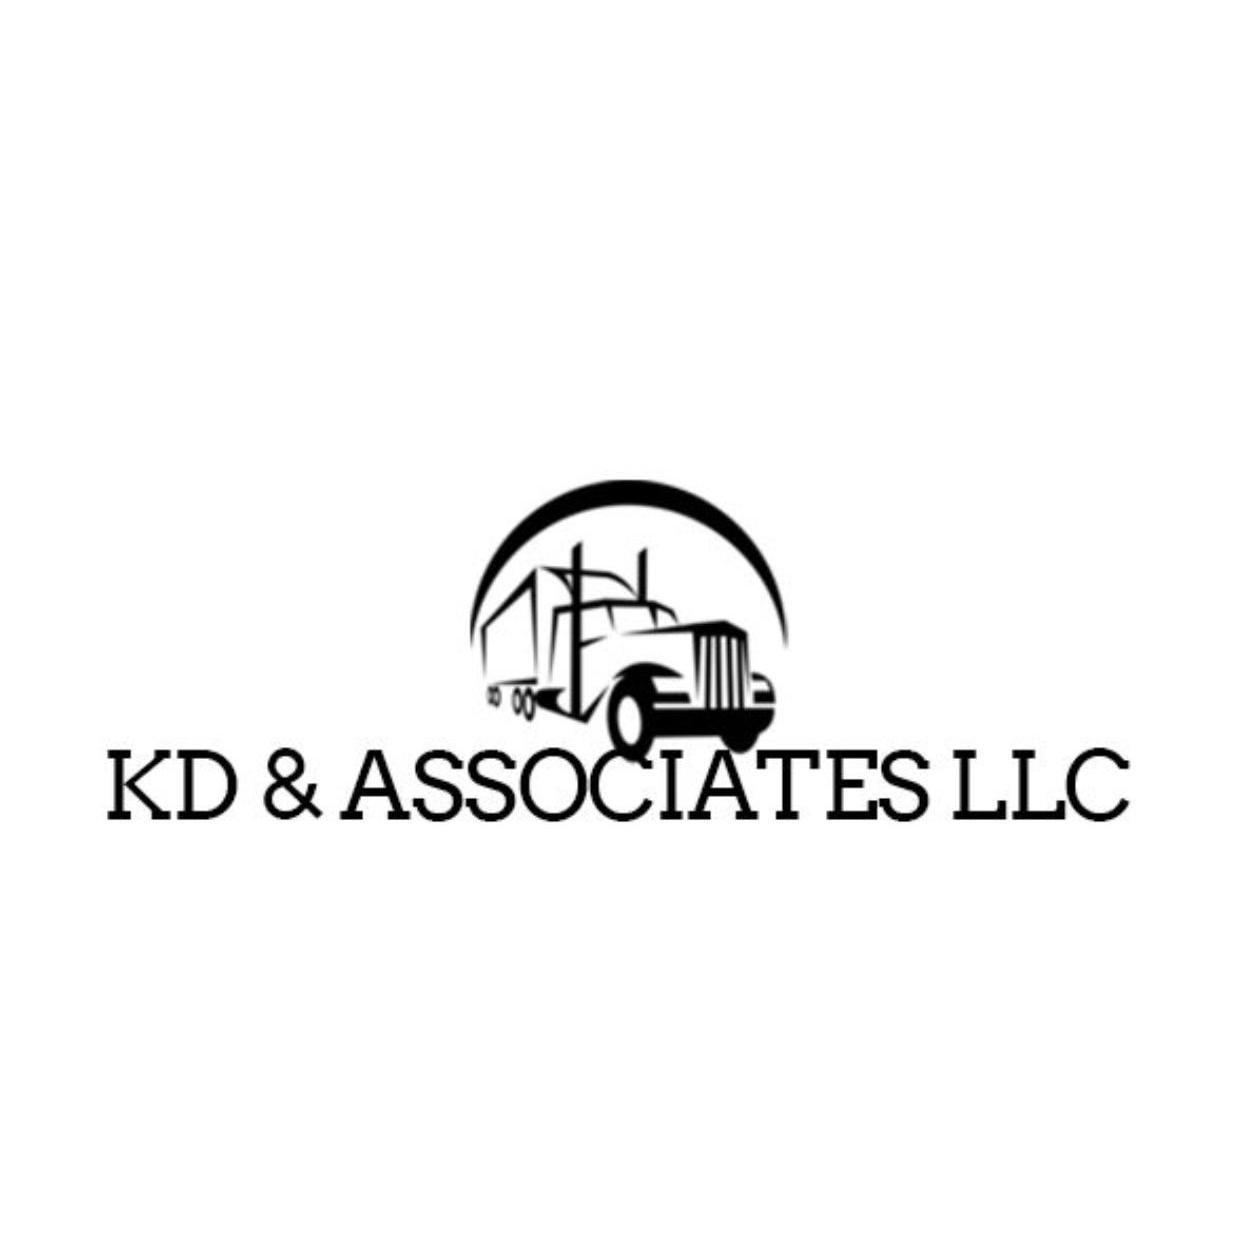 KD & Associates LLC